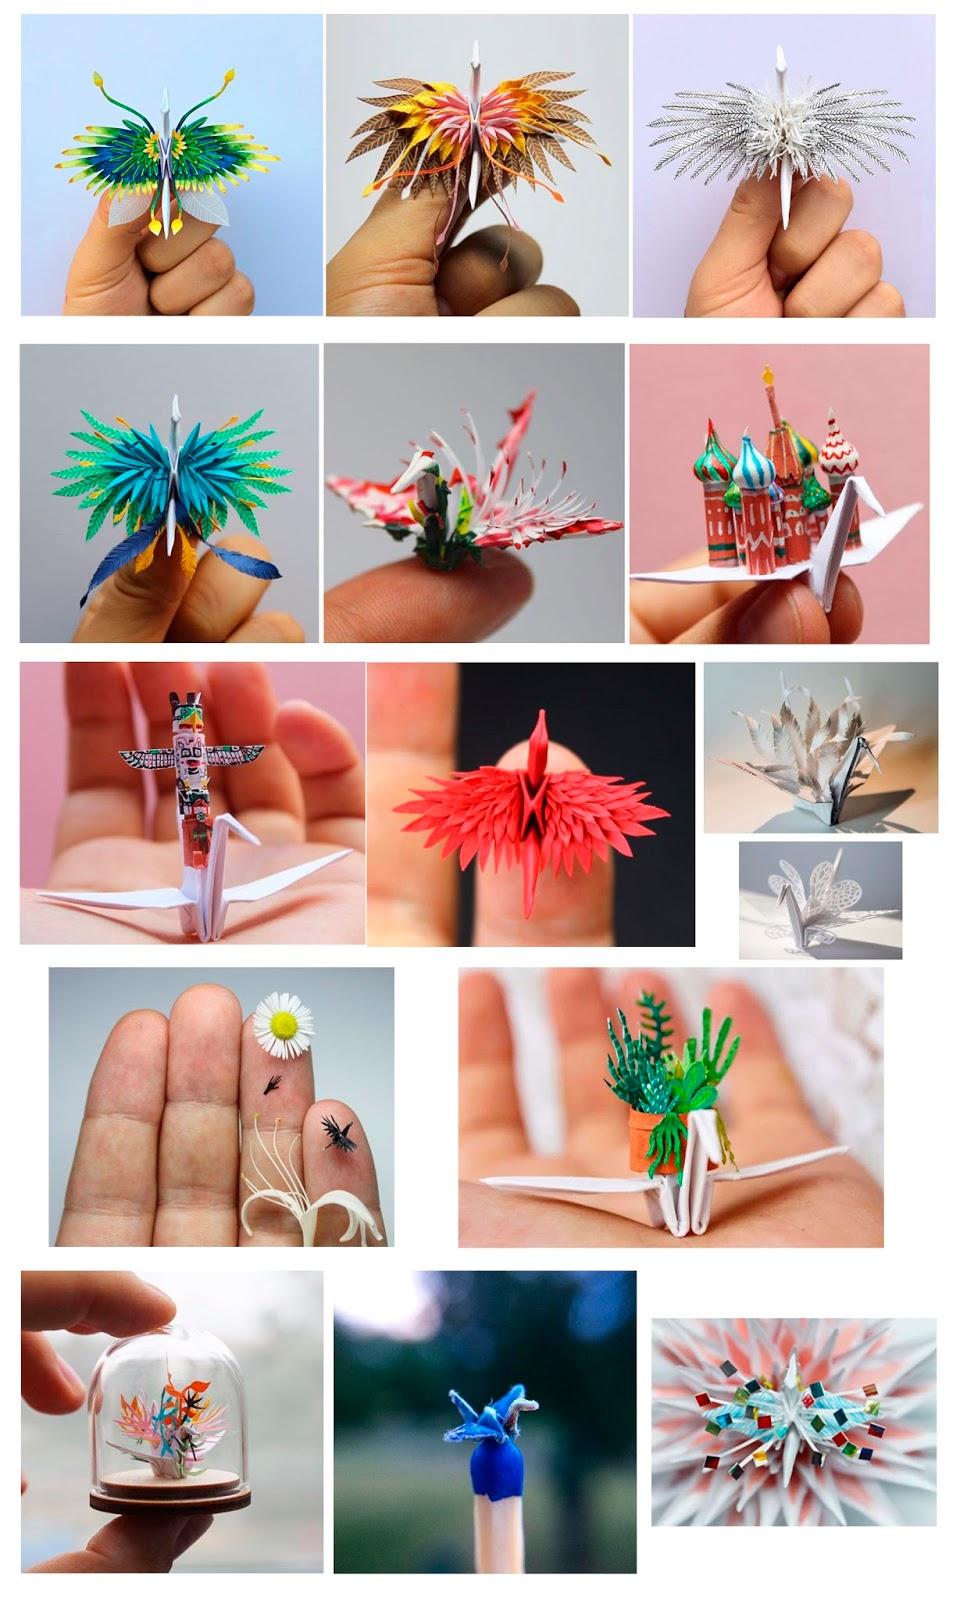 Las 1000 grullas de Cristian Marianciuc - origami - artist